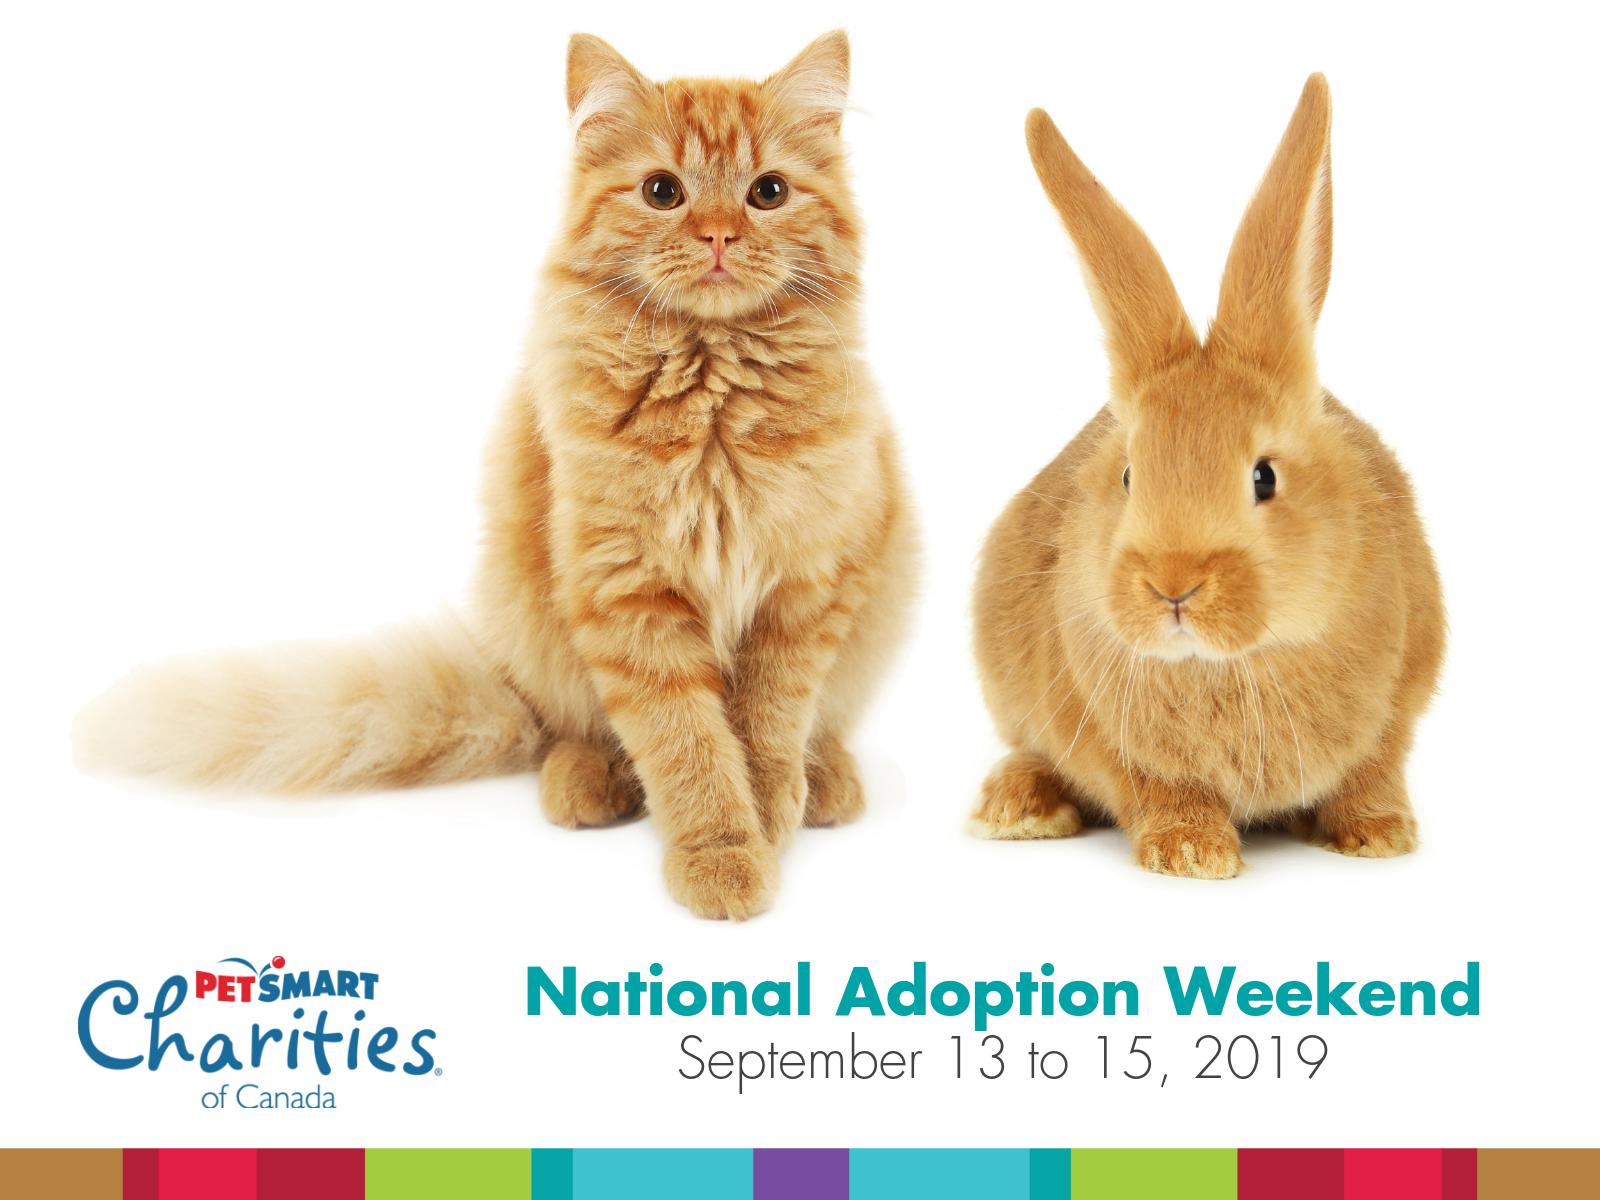 cat-and-rabbit-petsmart-adoption-even